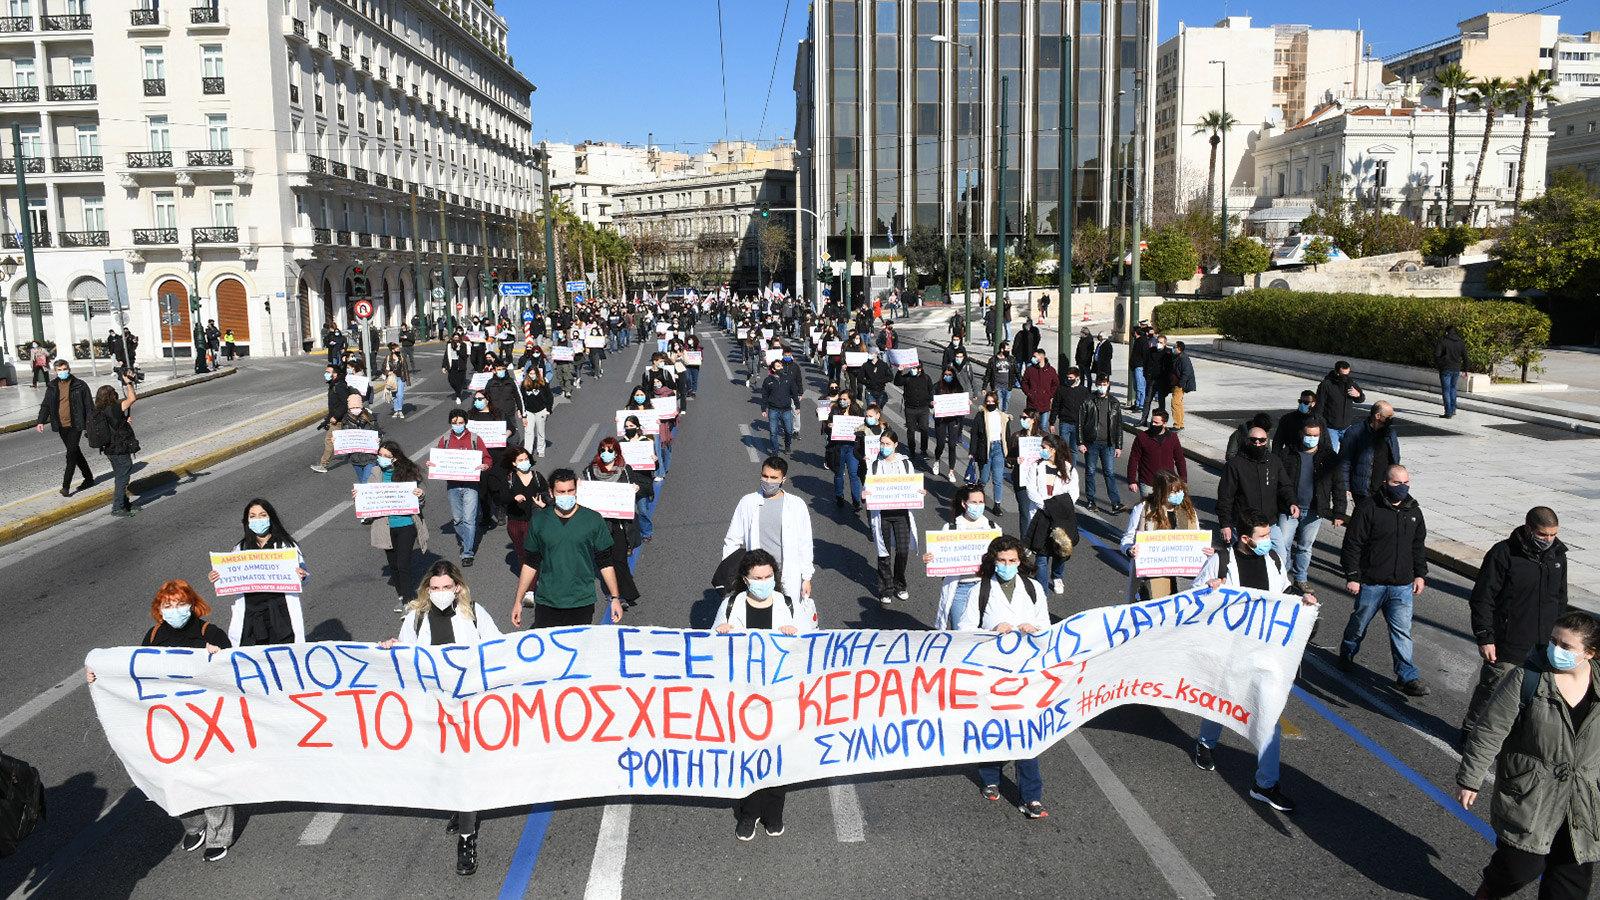 Students Demostration